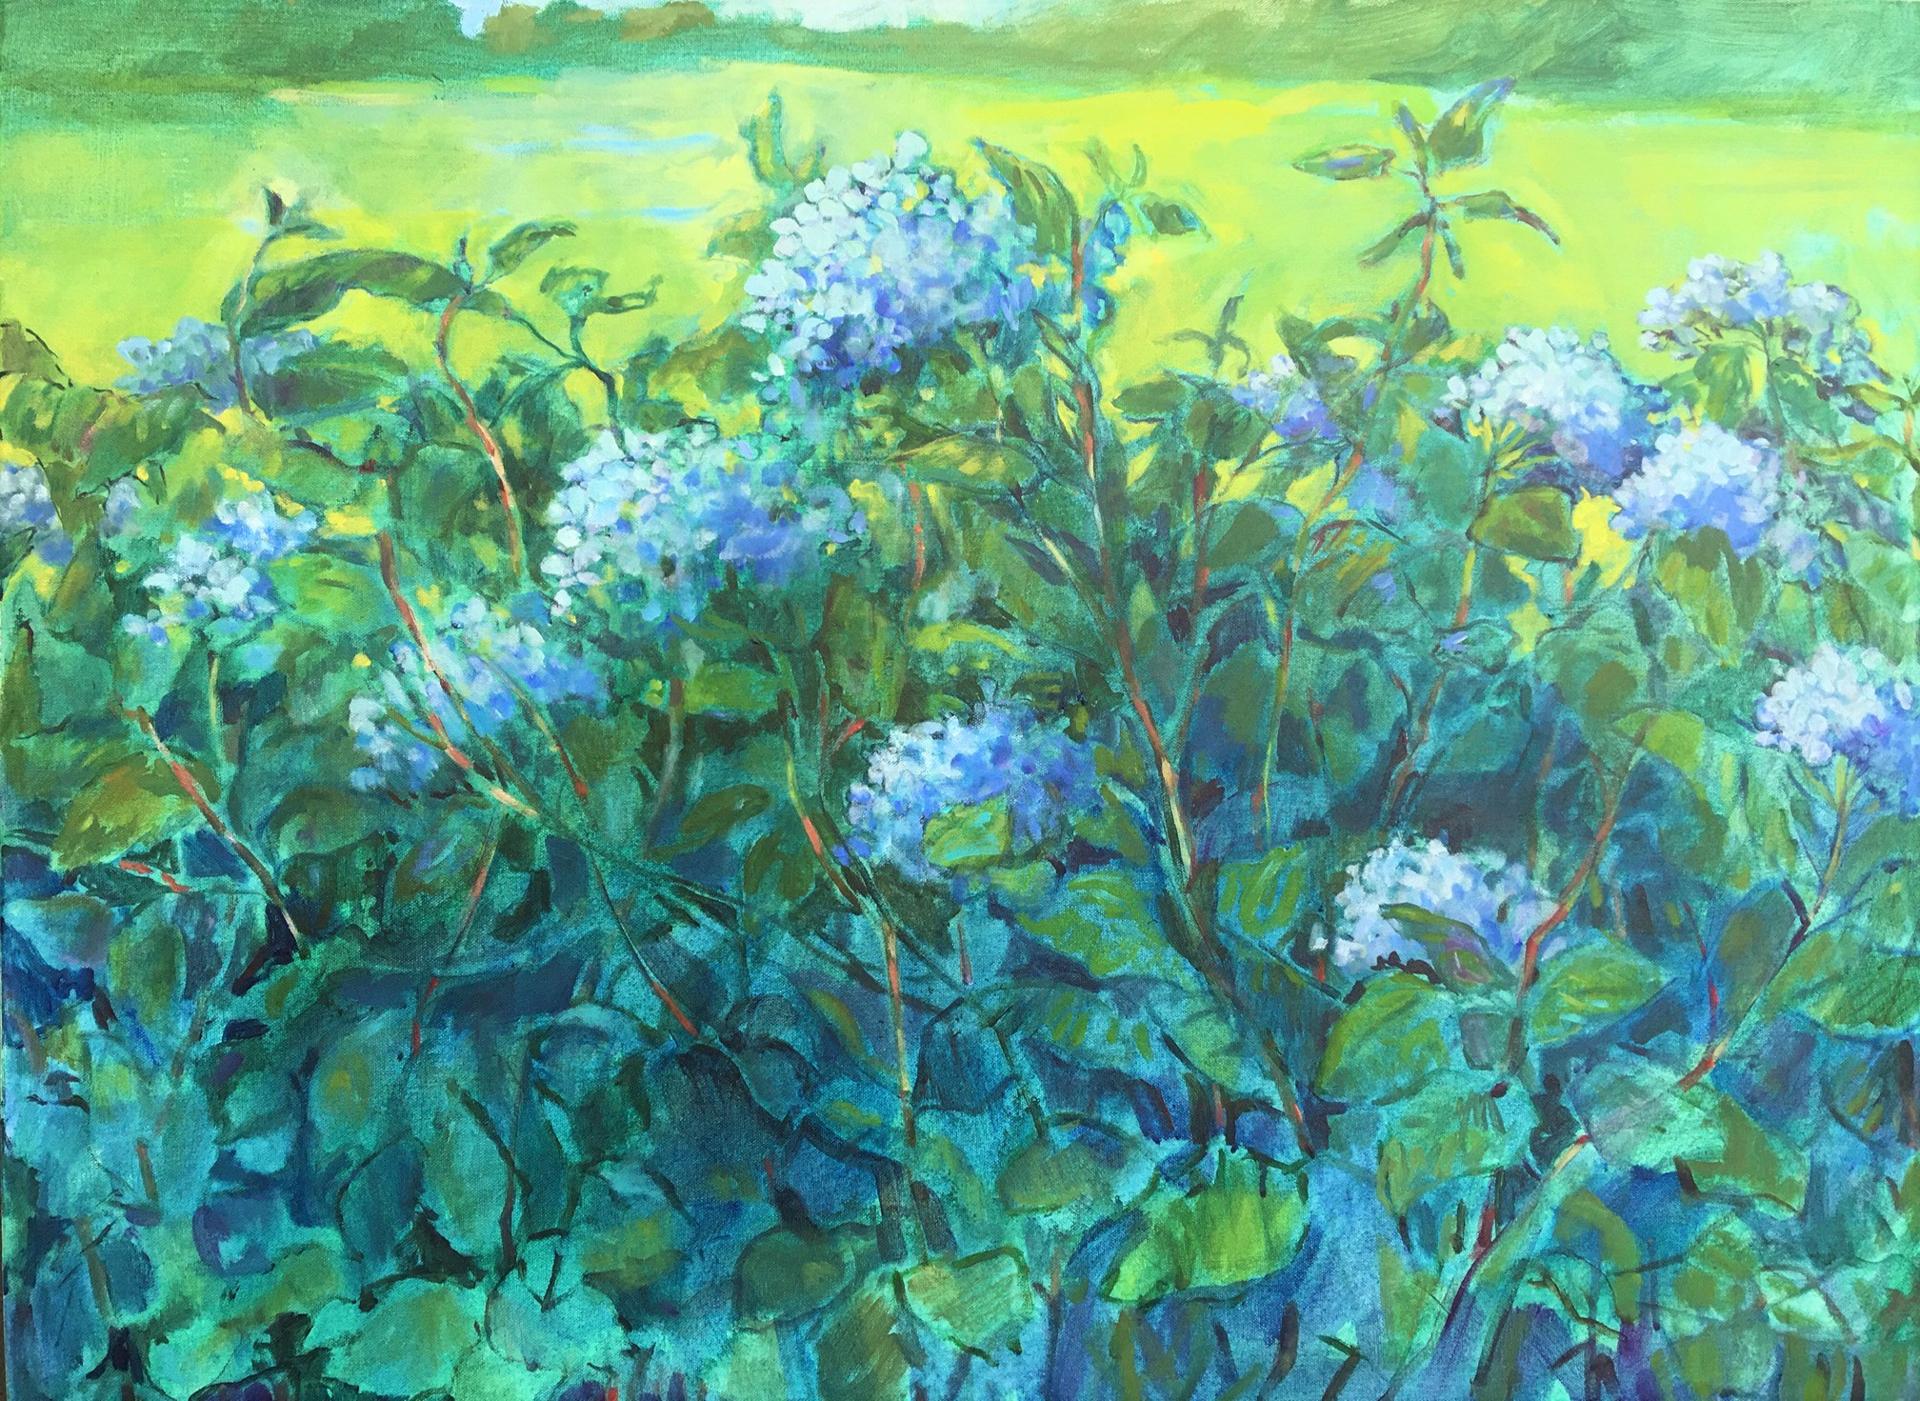 Hydrangea Garden by Nan Cunningham